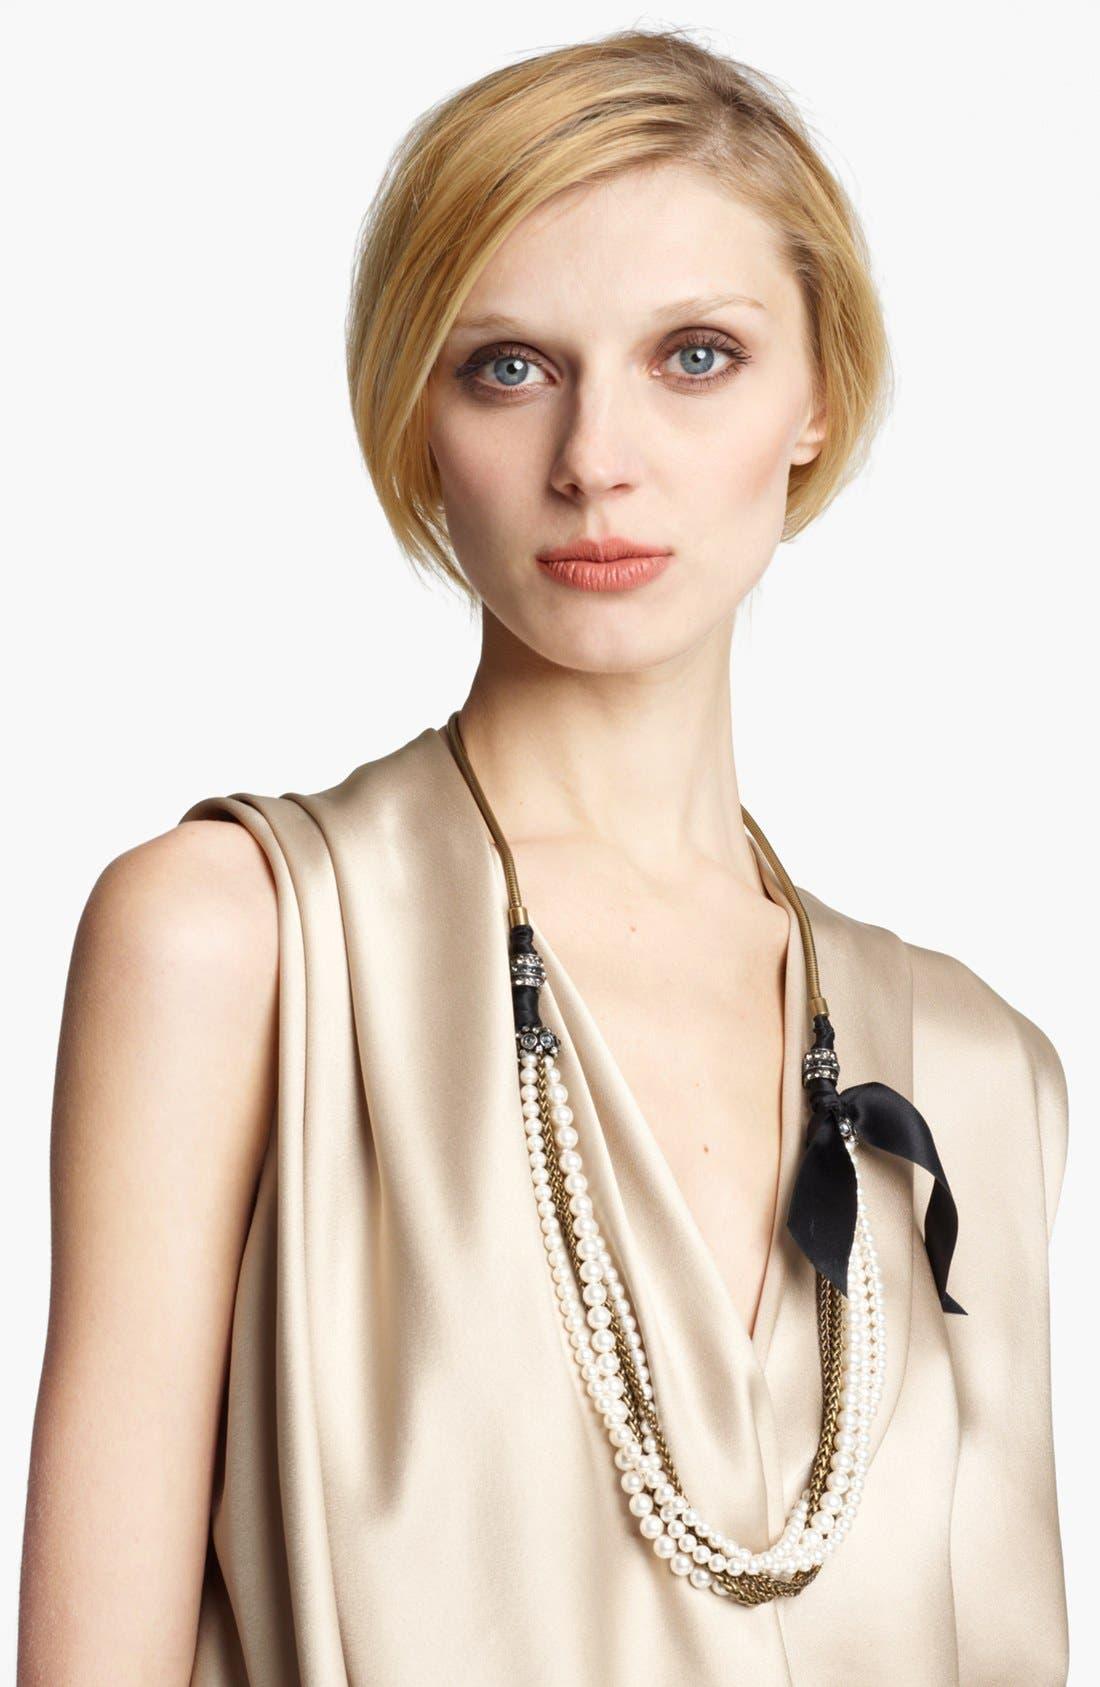 Alternate Image 1 Selected - Lanvin 'Metropolis' Long Chain Necklace